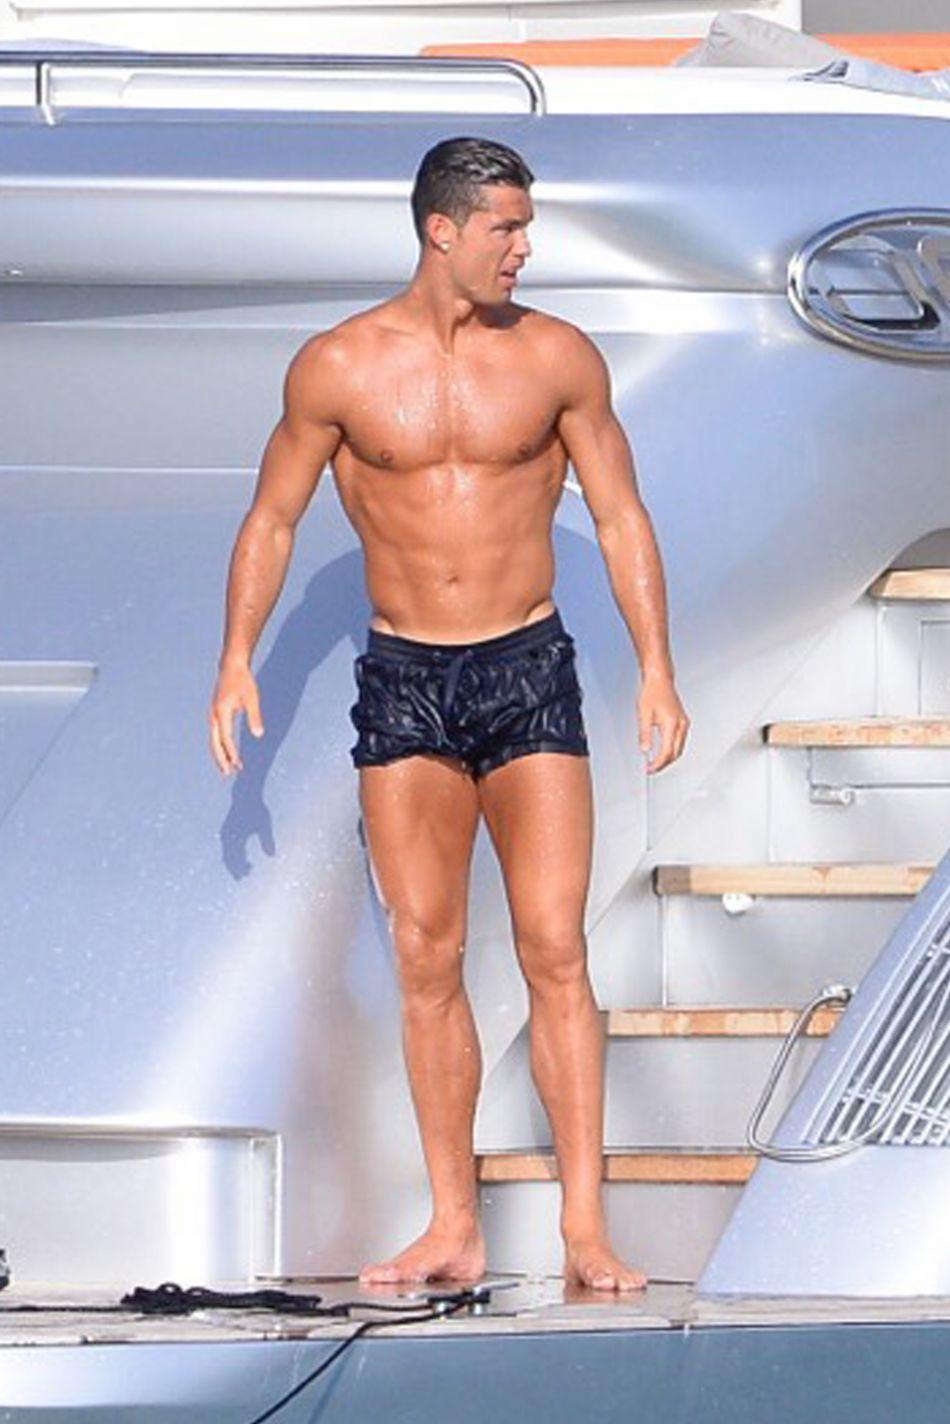 Après le football, exhiber ses abdos est la deuxième passion de Cristiano Ronaldo.